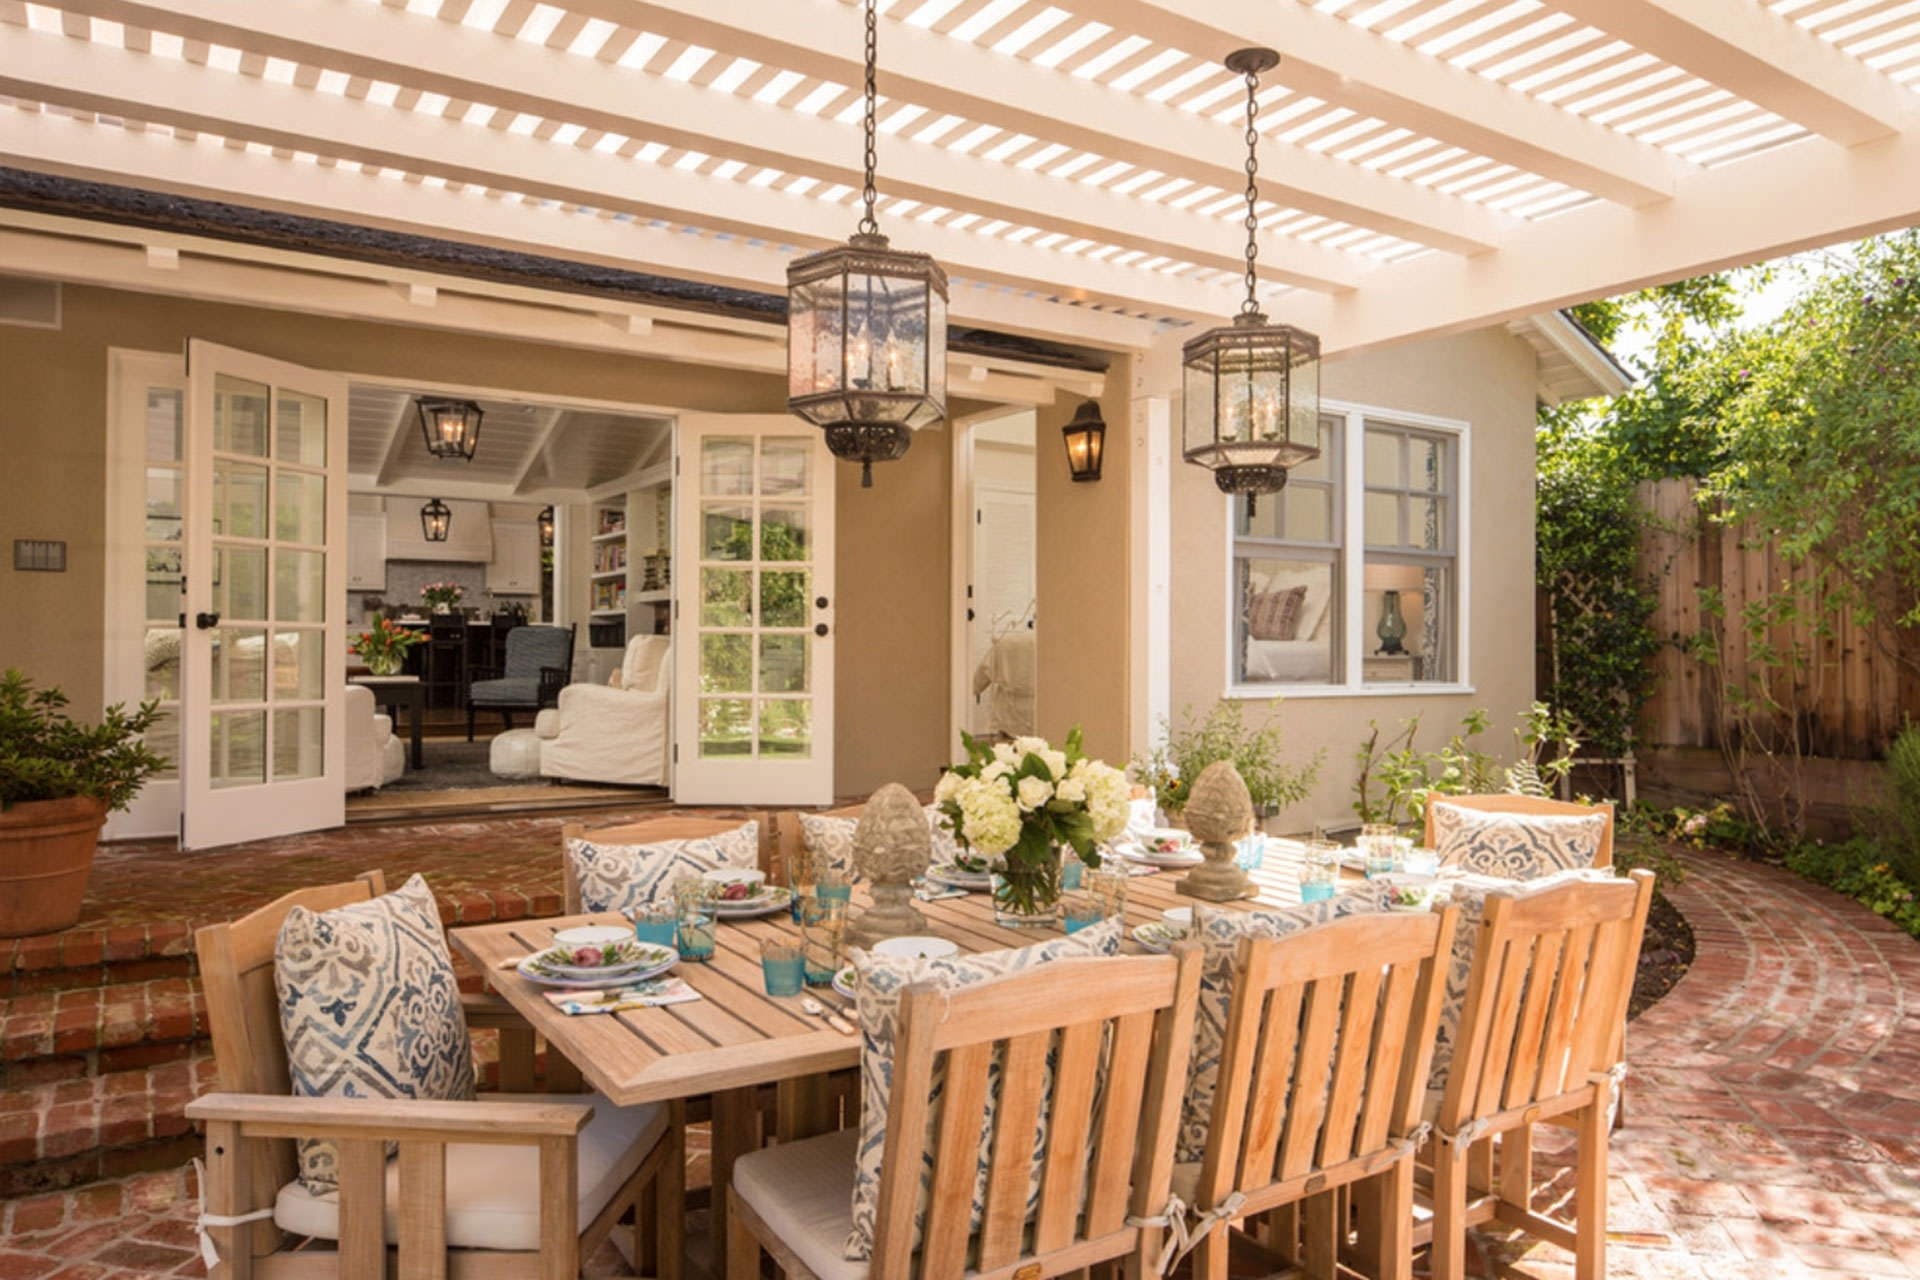 Most Popular Outdoor Dining Lanterns Regarding 33 Neat Design Outdoor Lantern Lighting Ideas Five Pergola To (View 16 of 20)